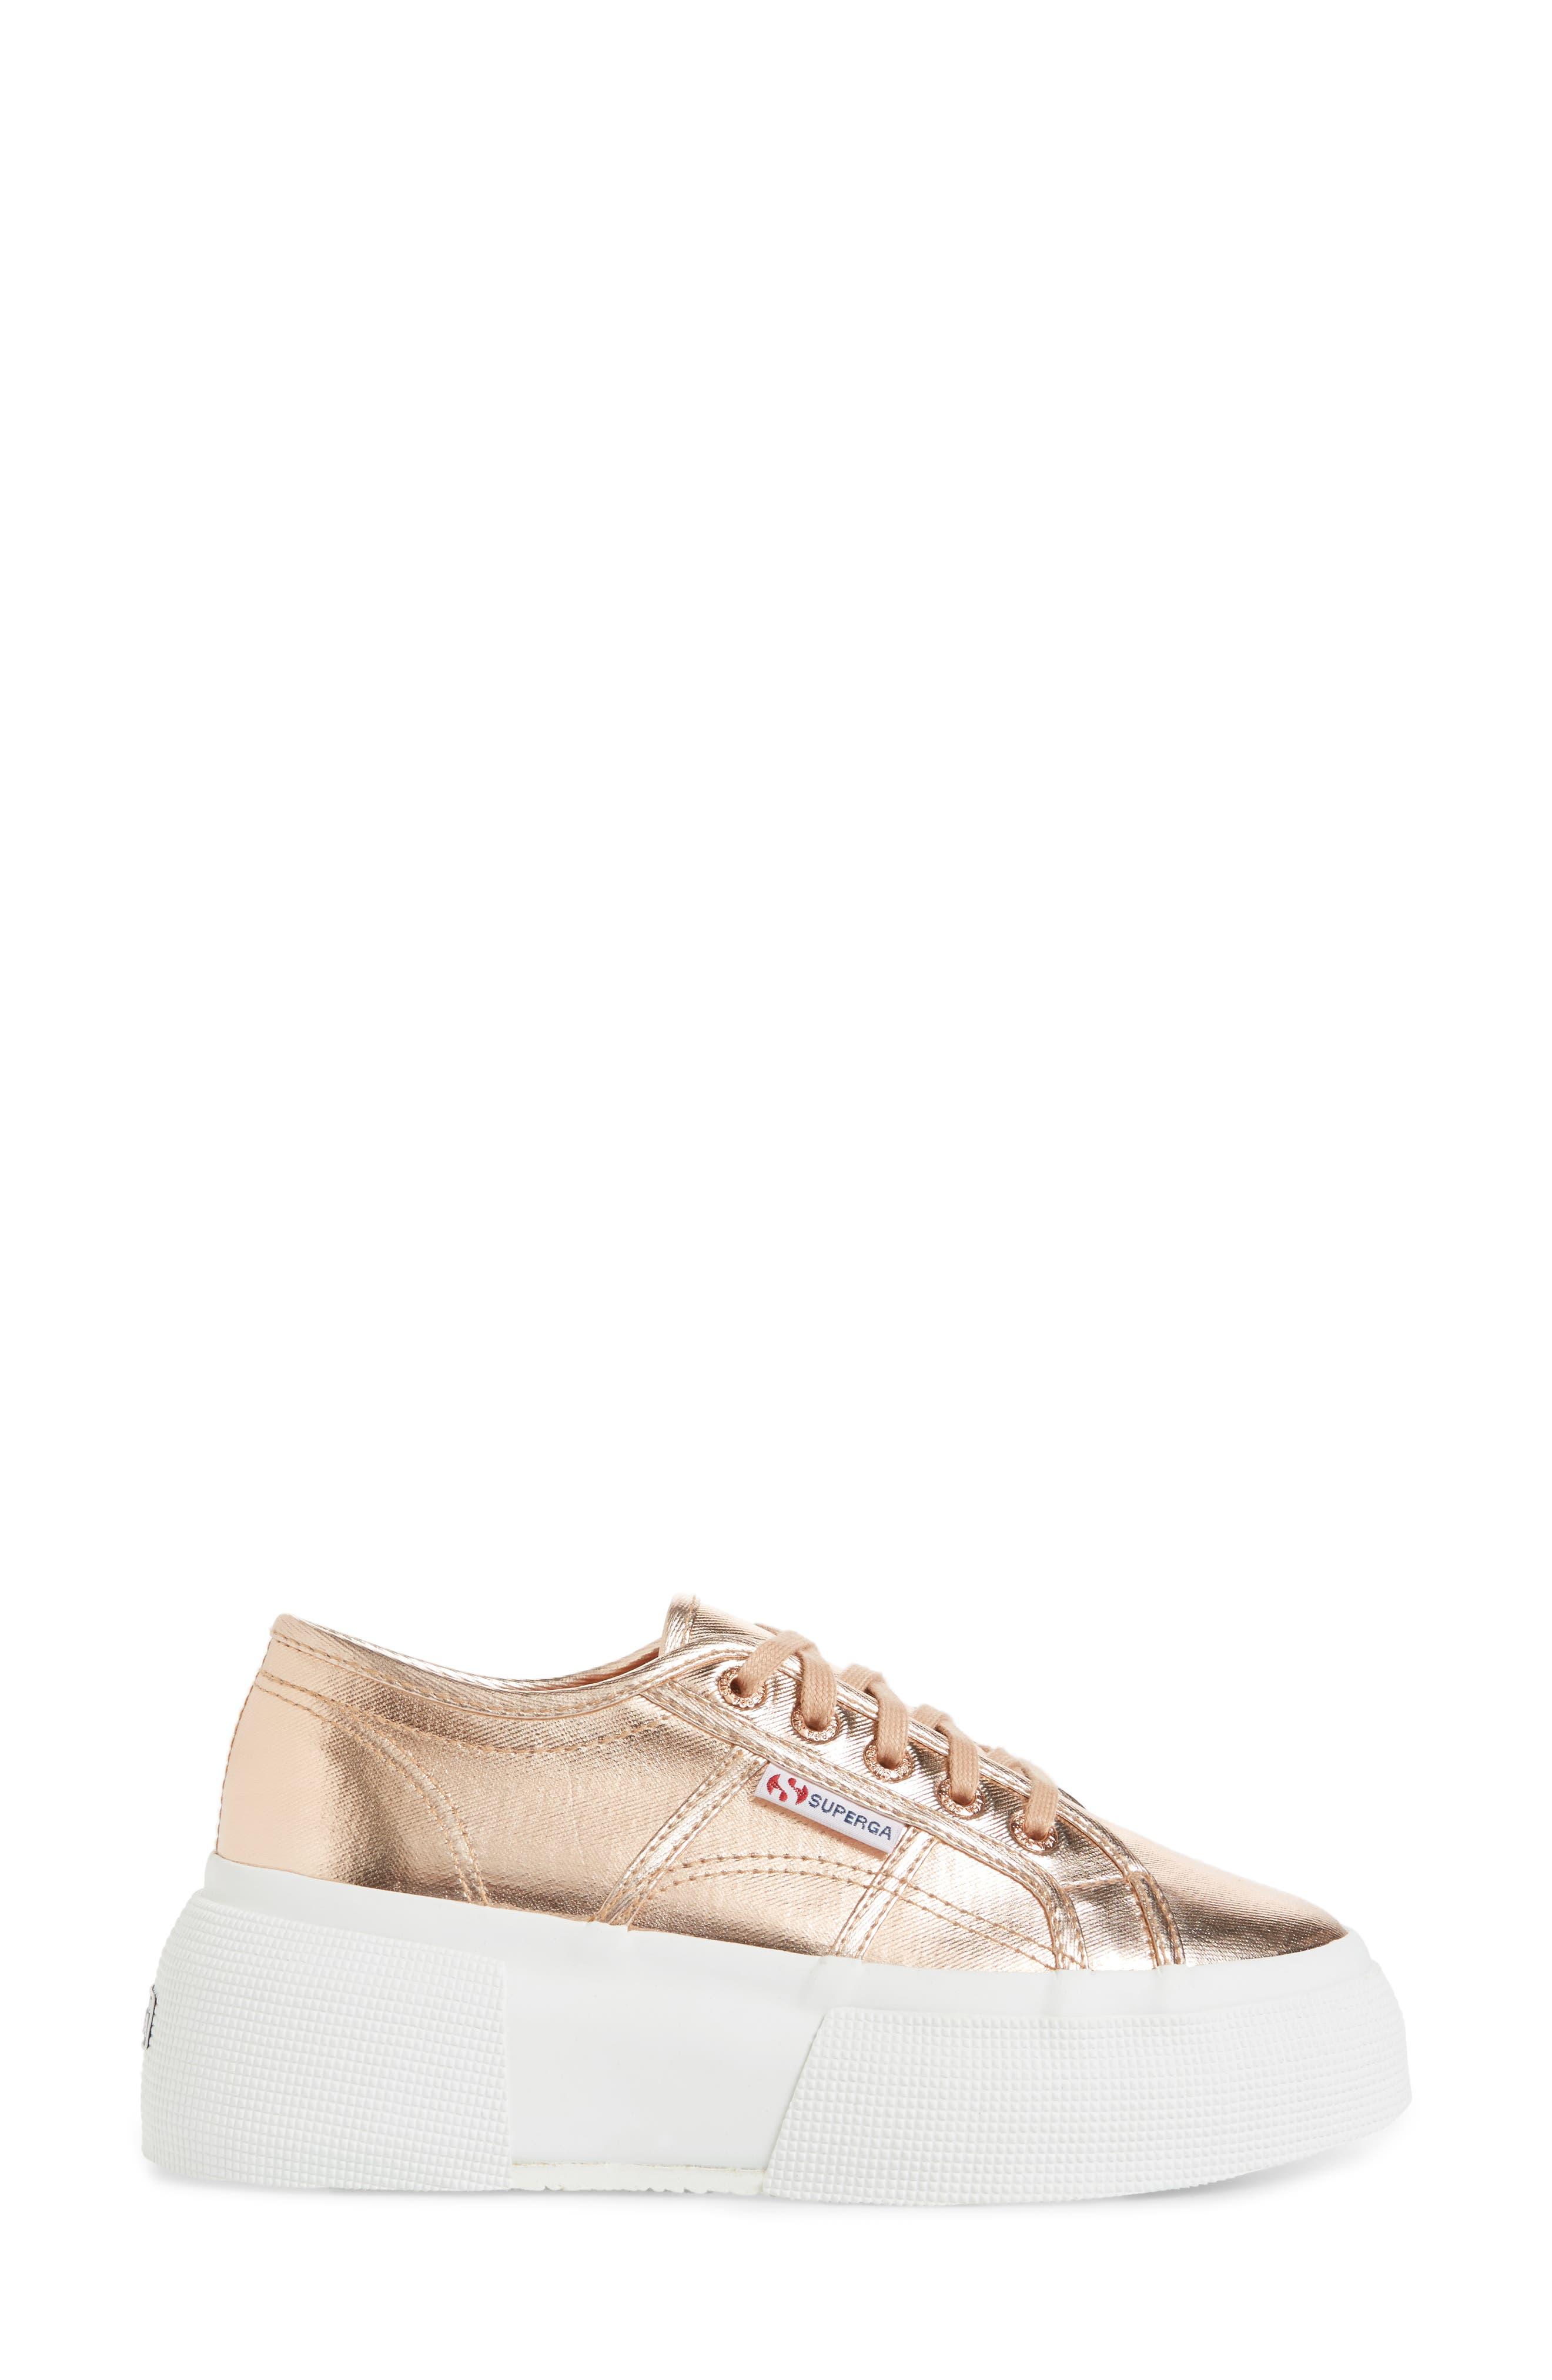 2287 Cotu Platform Sneaker,                             Alternate thumbnail 6, color,